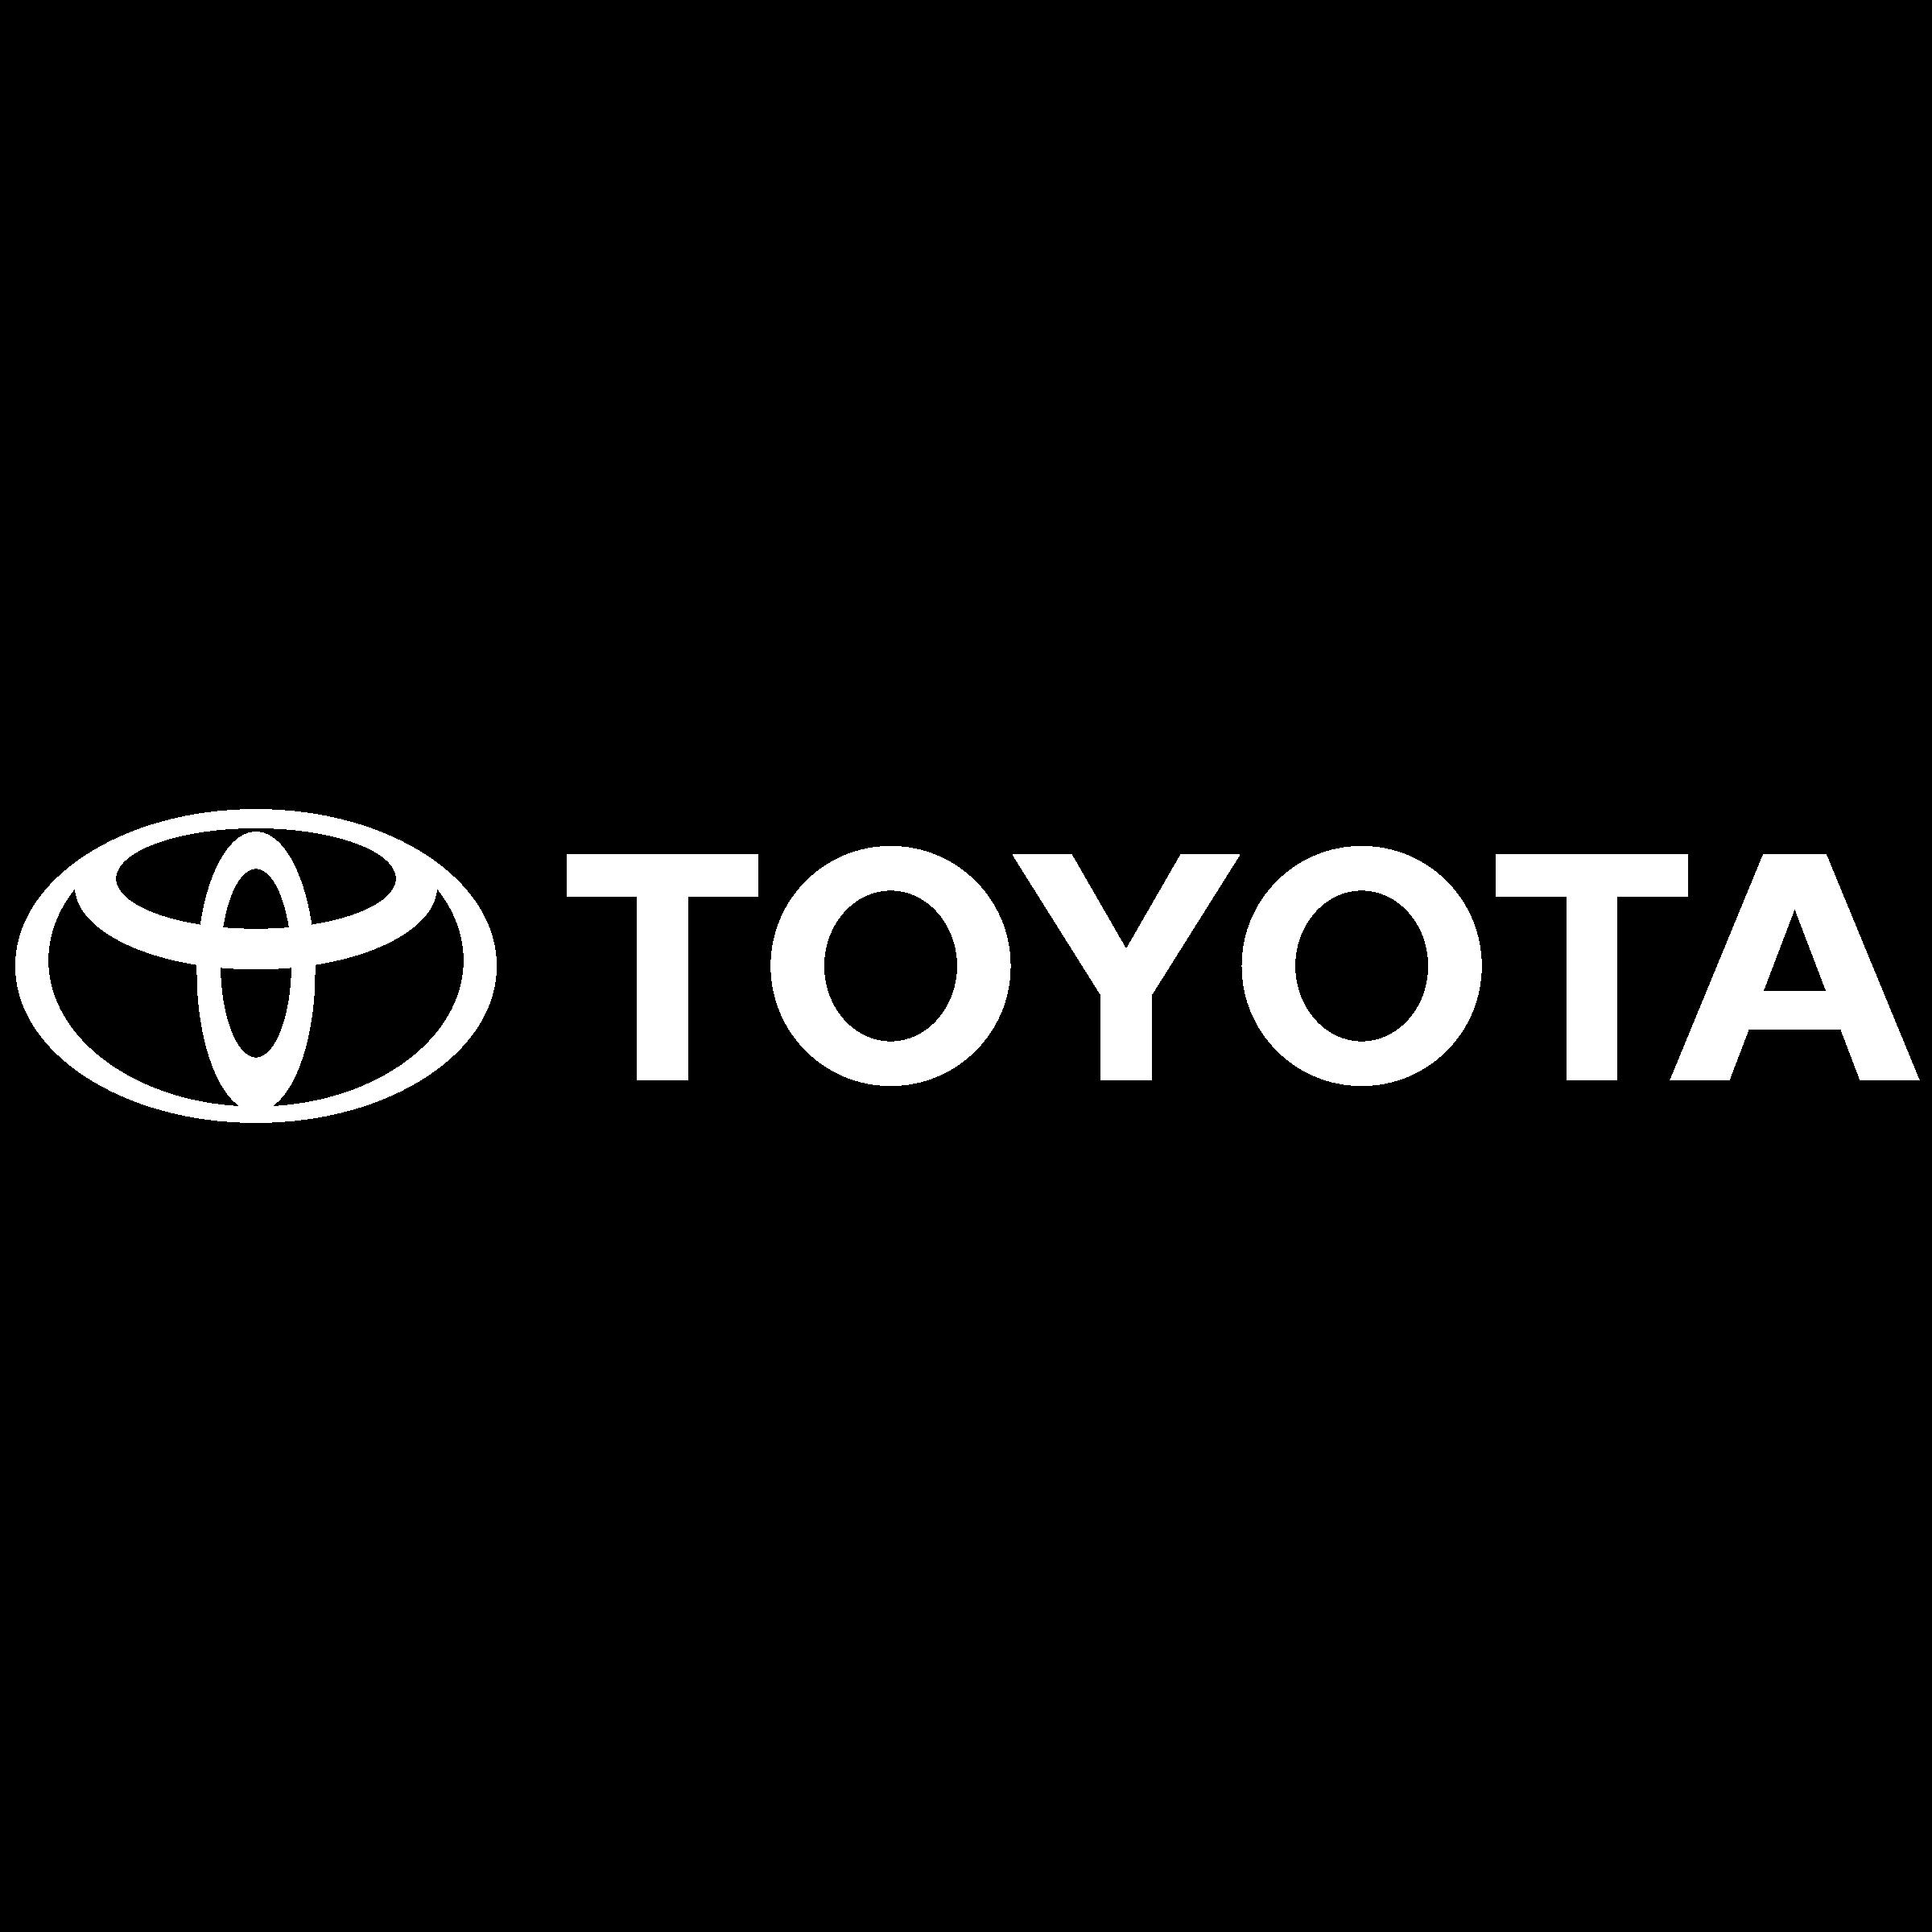 toyota logo png transparent amp svg vector freebie supply